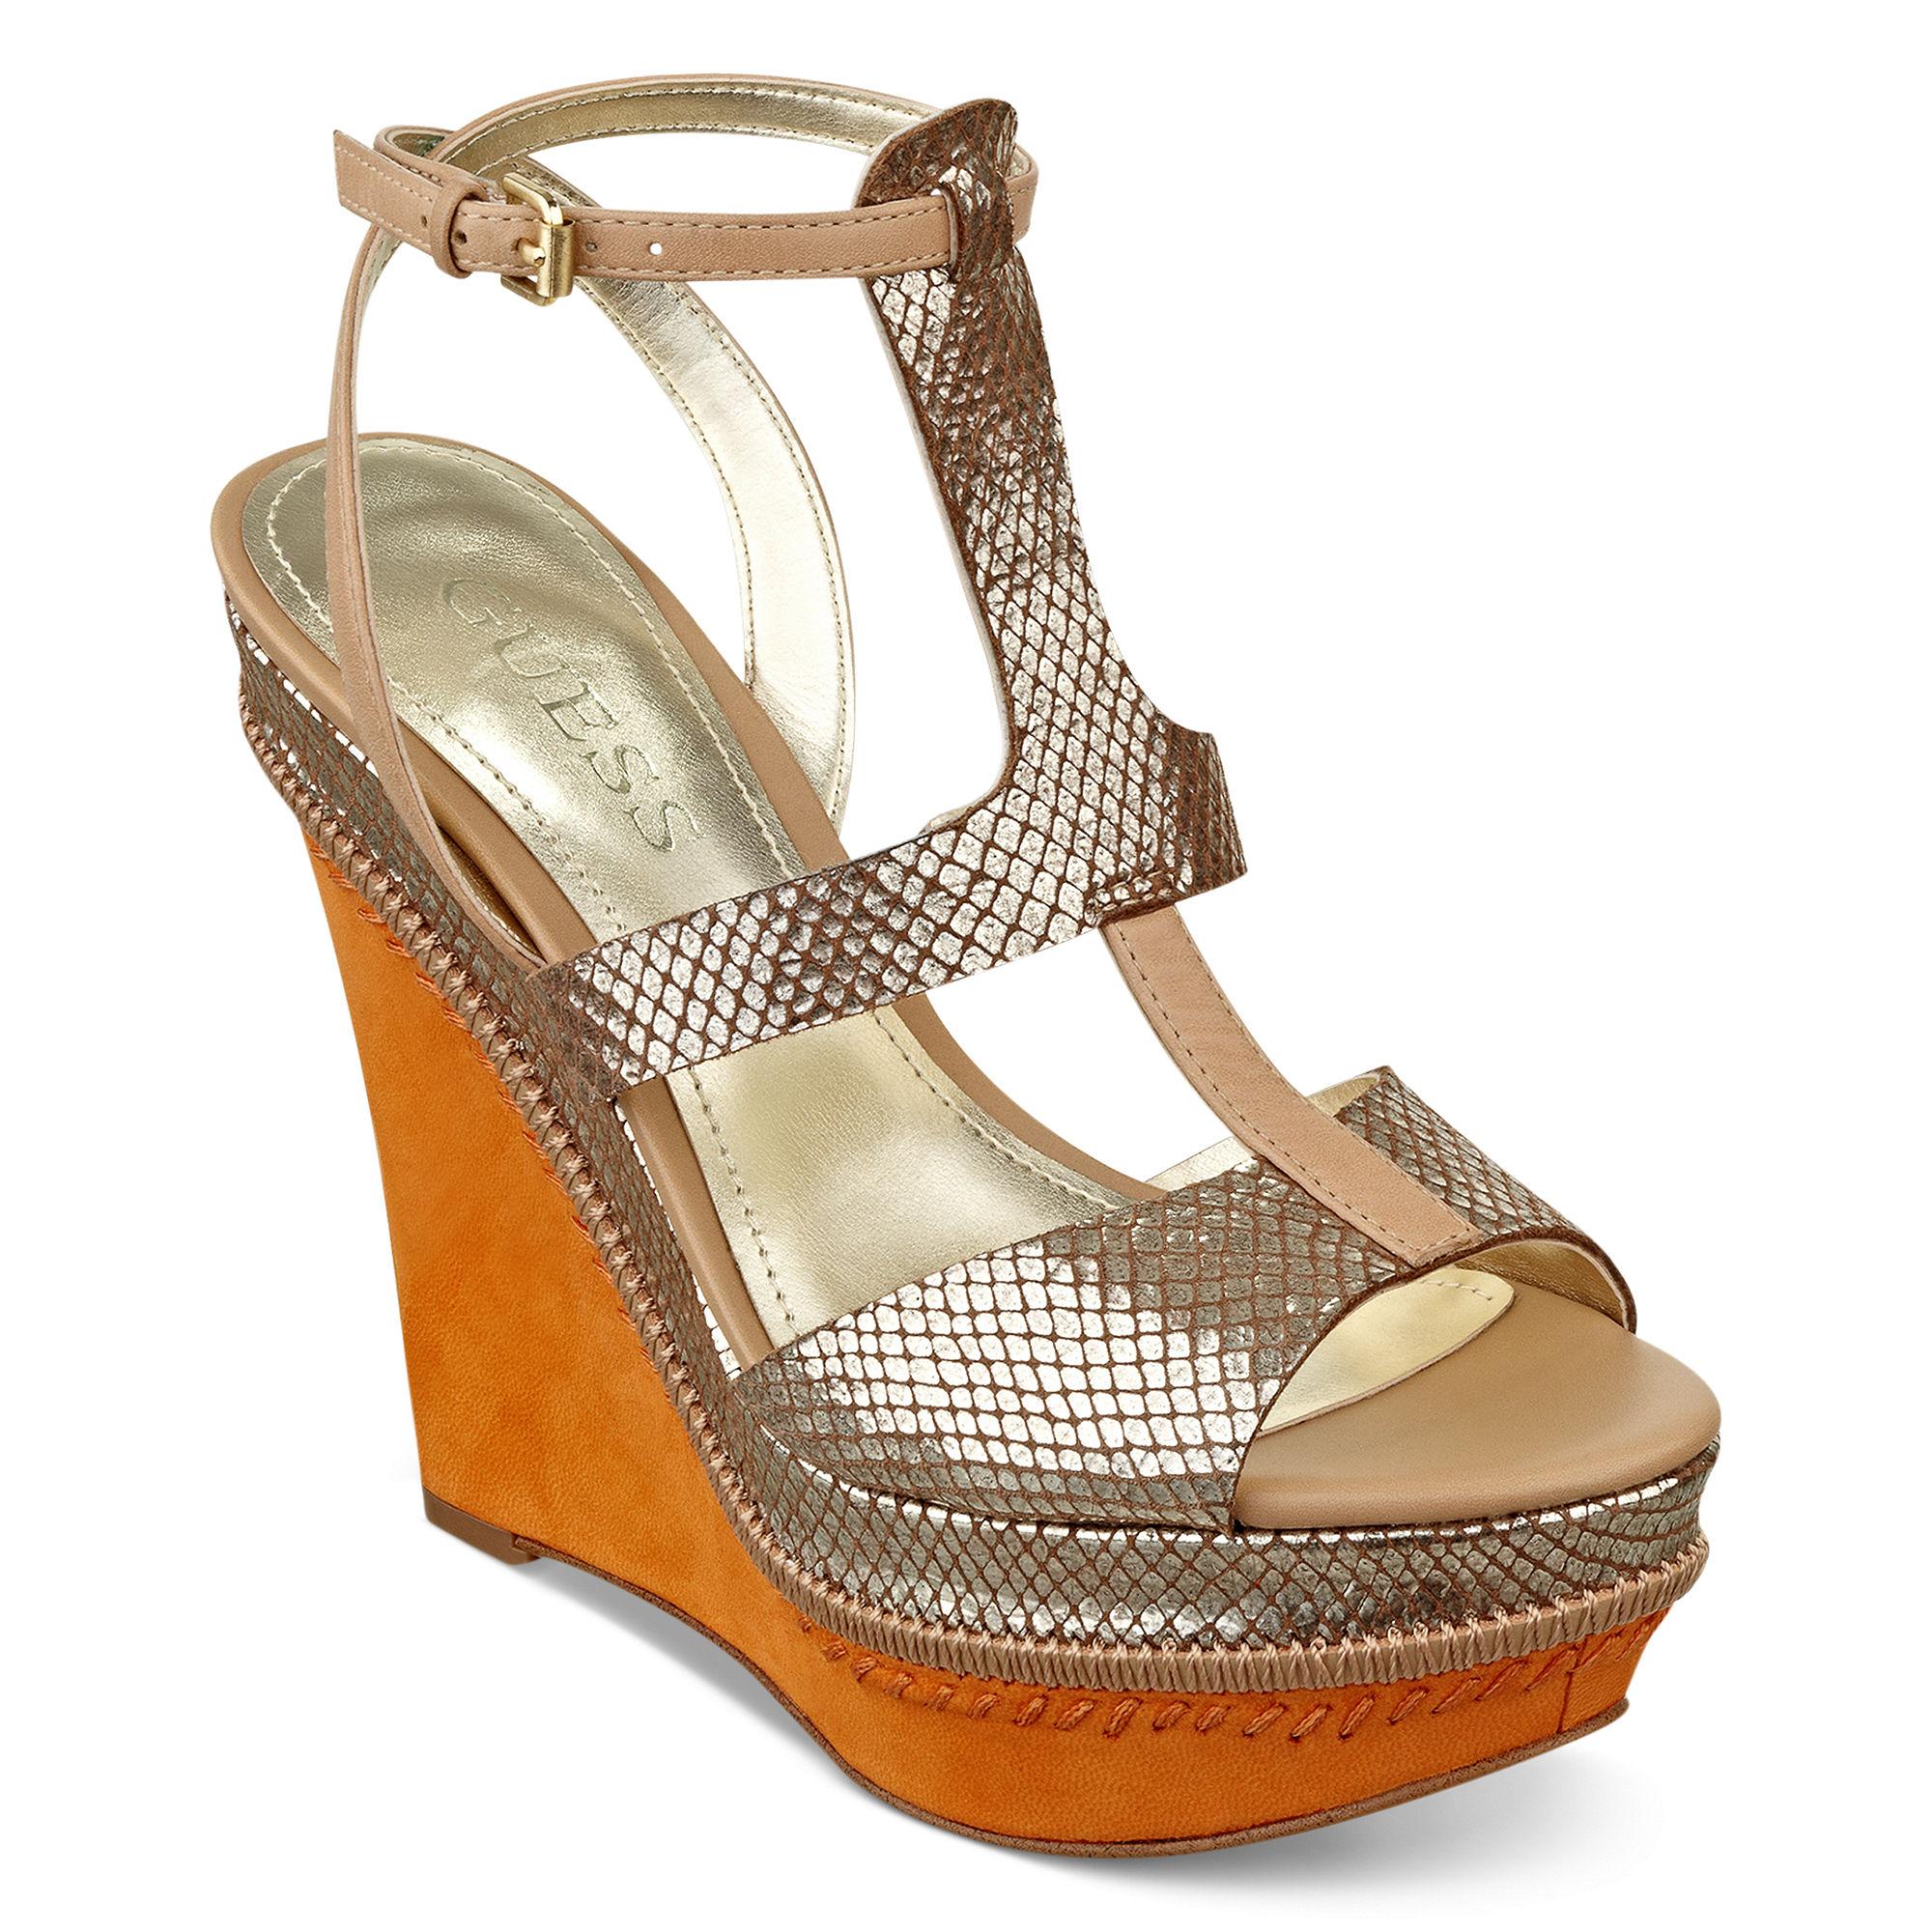 gold wedges sandals - 28 images - michael kors gold kami t ...